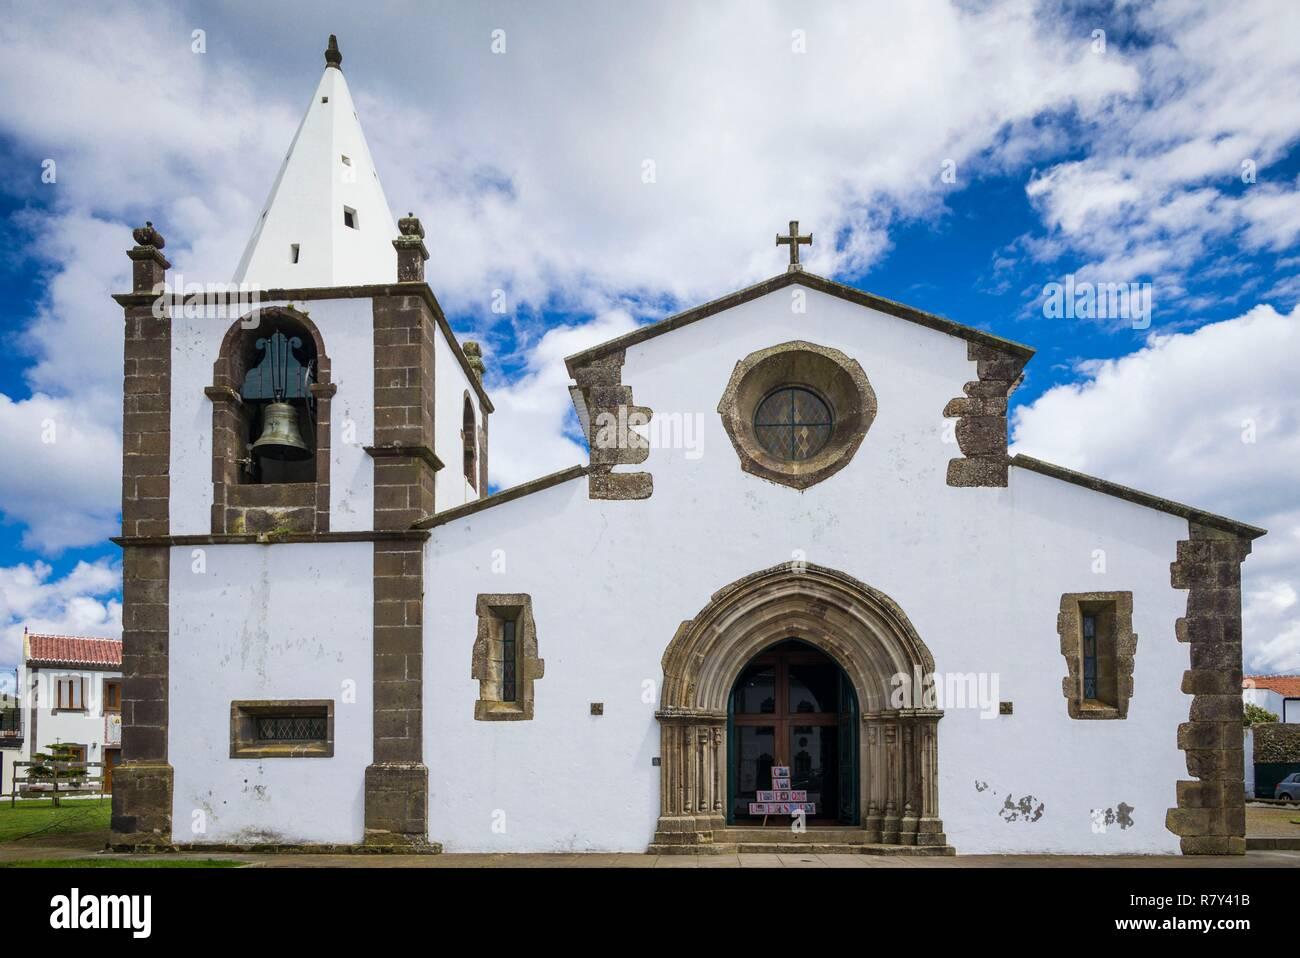 Portugal, Azores, Terceira Island, Sao Sebastiao, 15th century town church, exterior - Stock Image